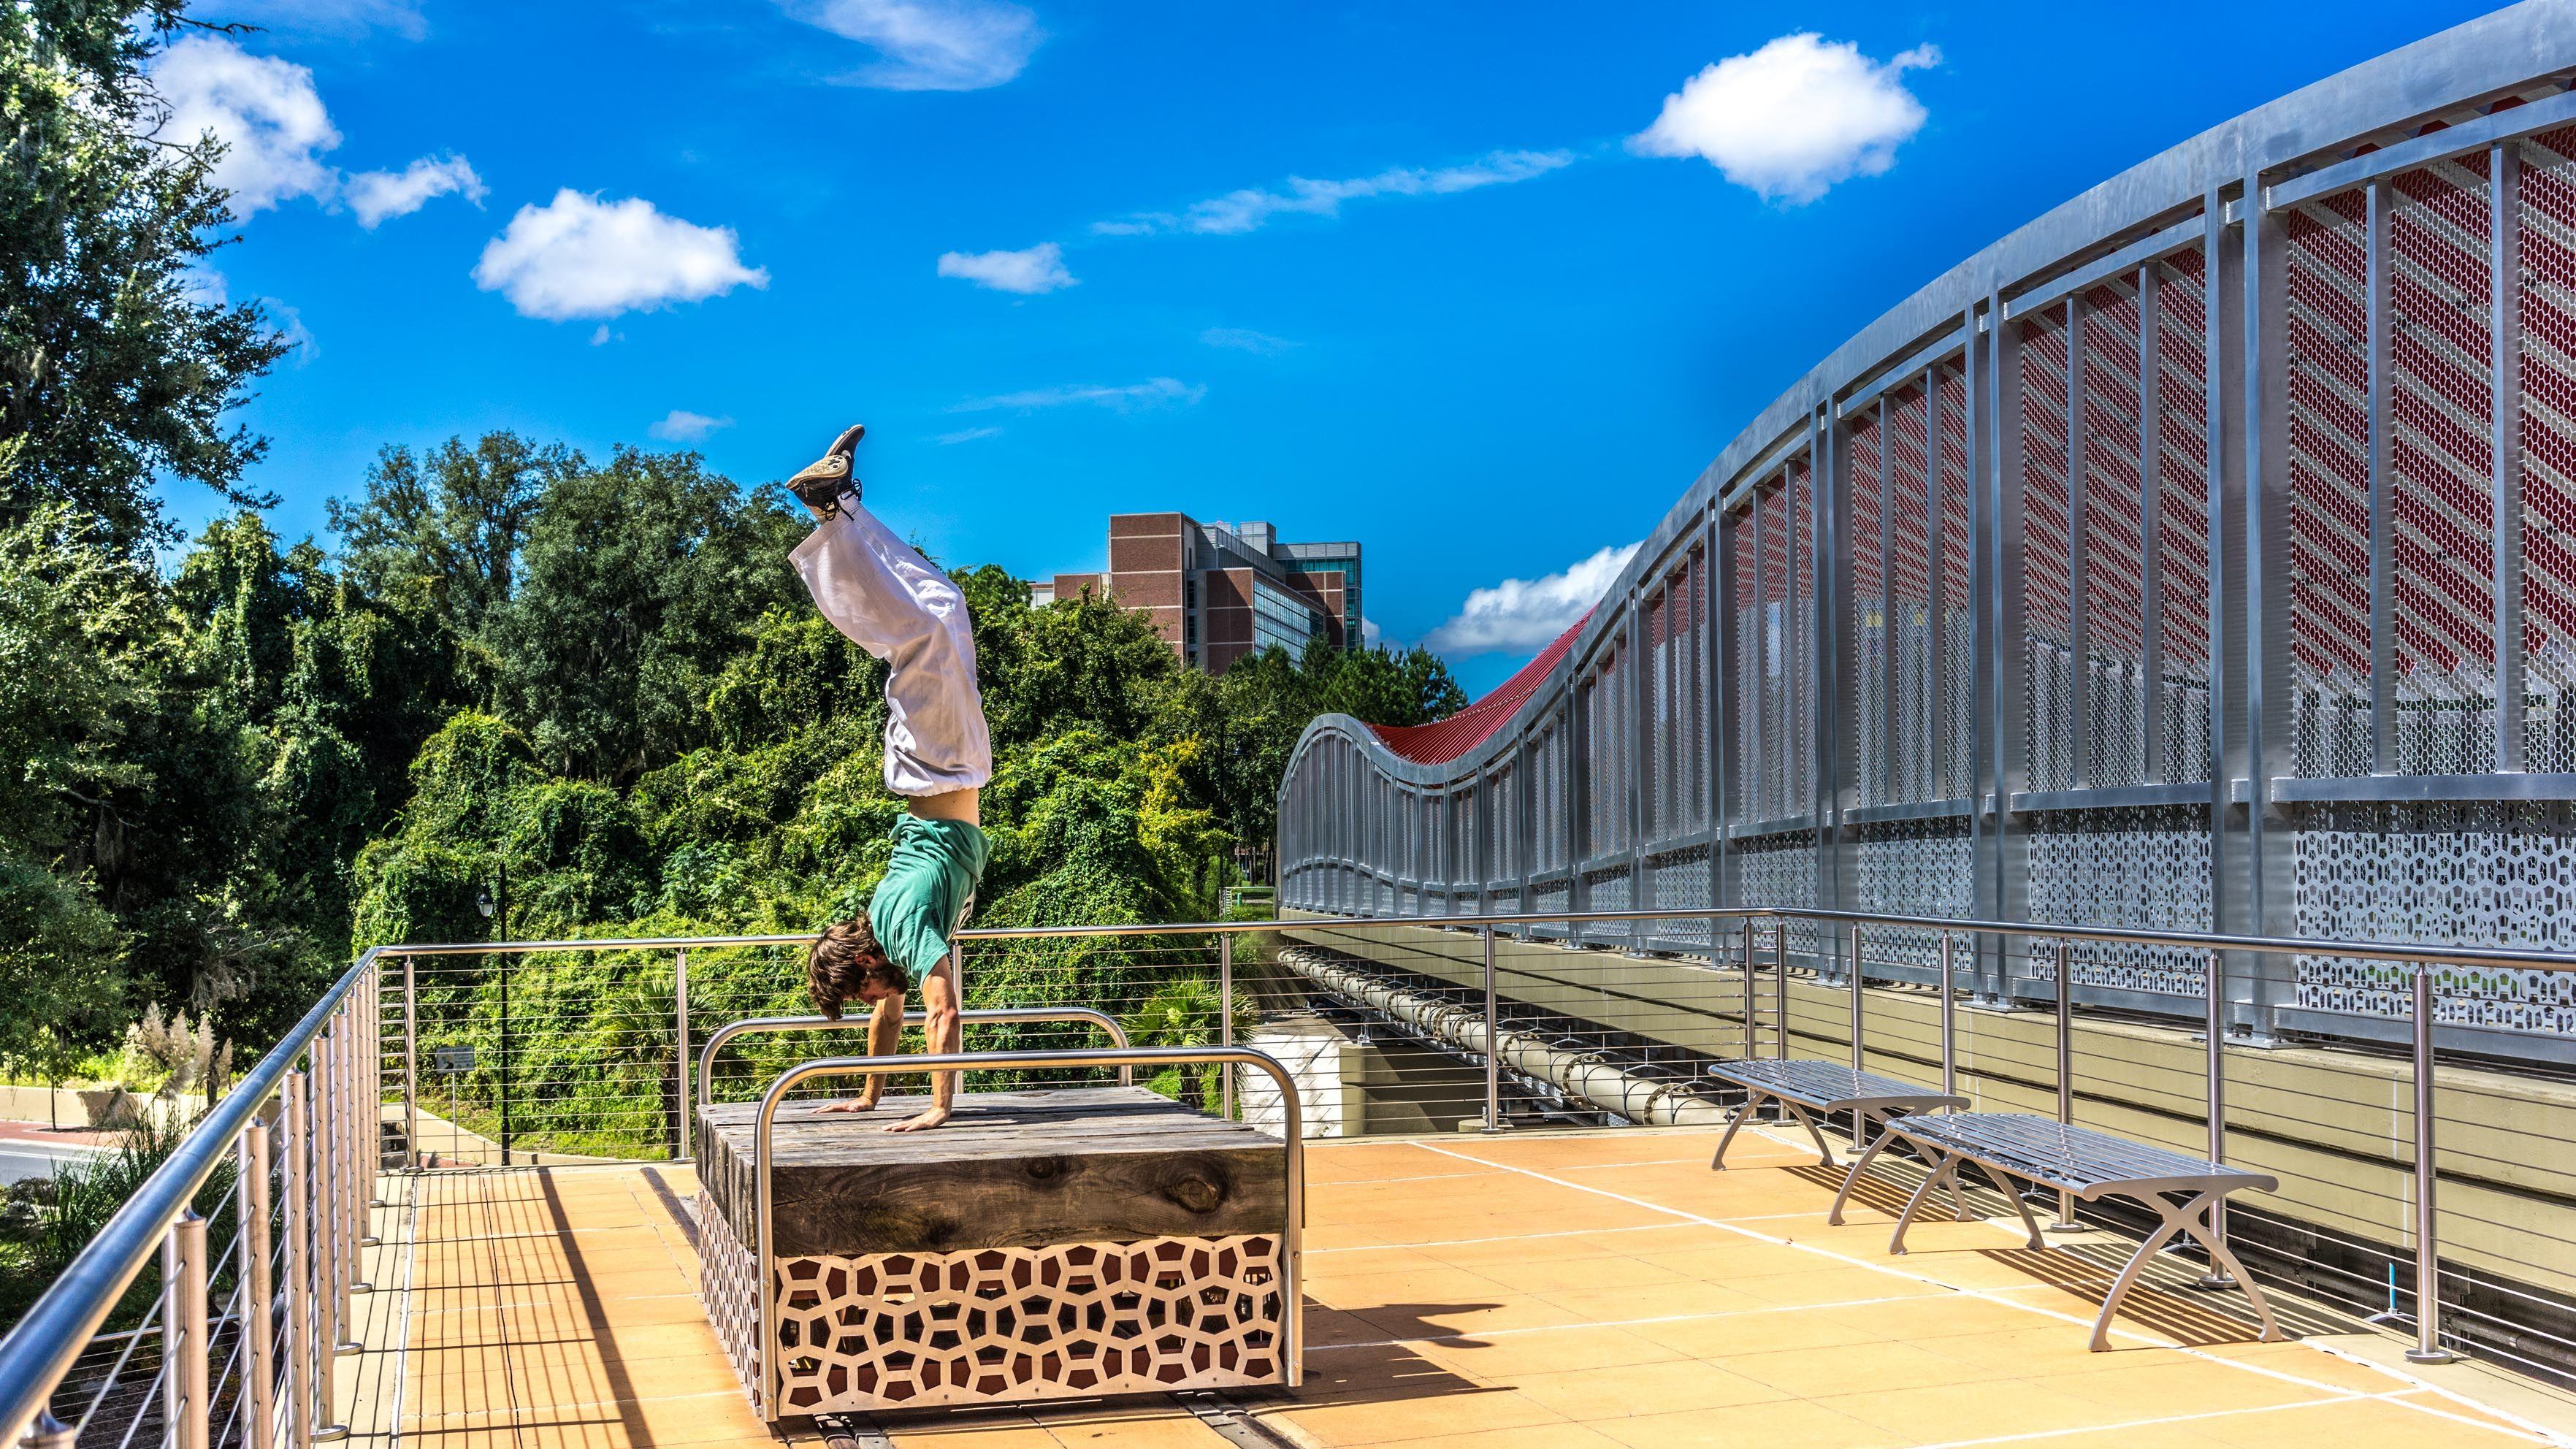 Helyx bridge handstand photo_raw